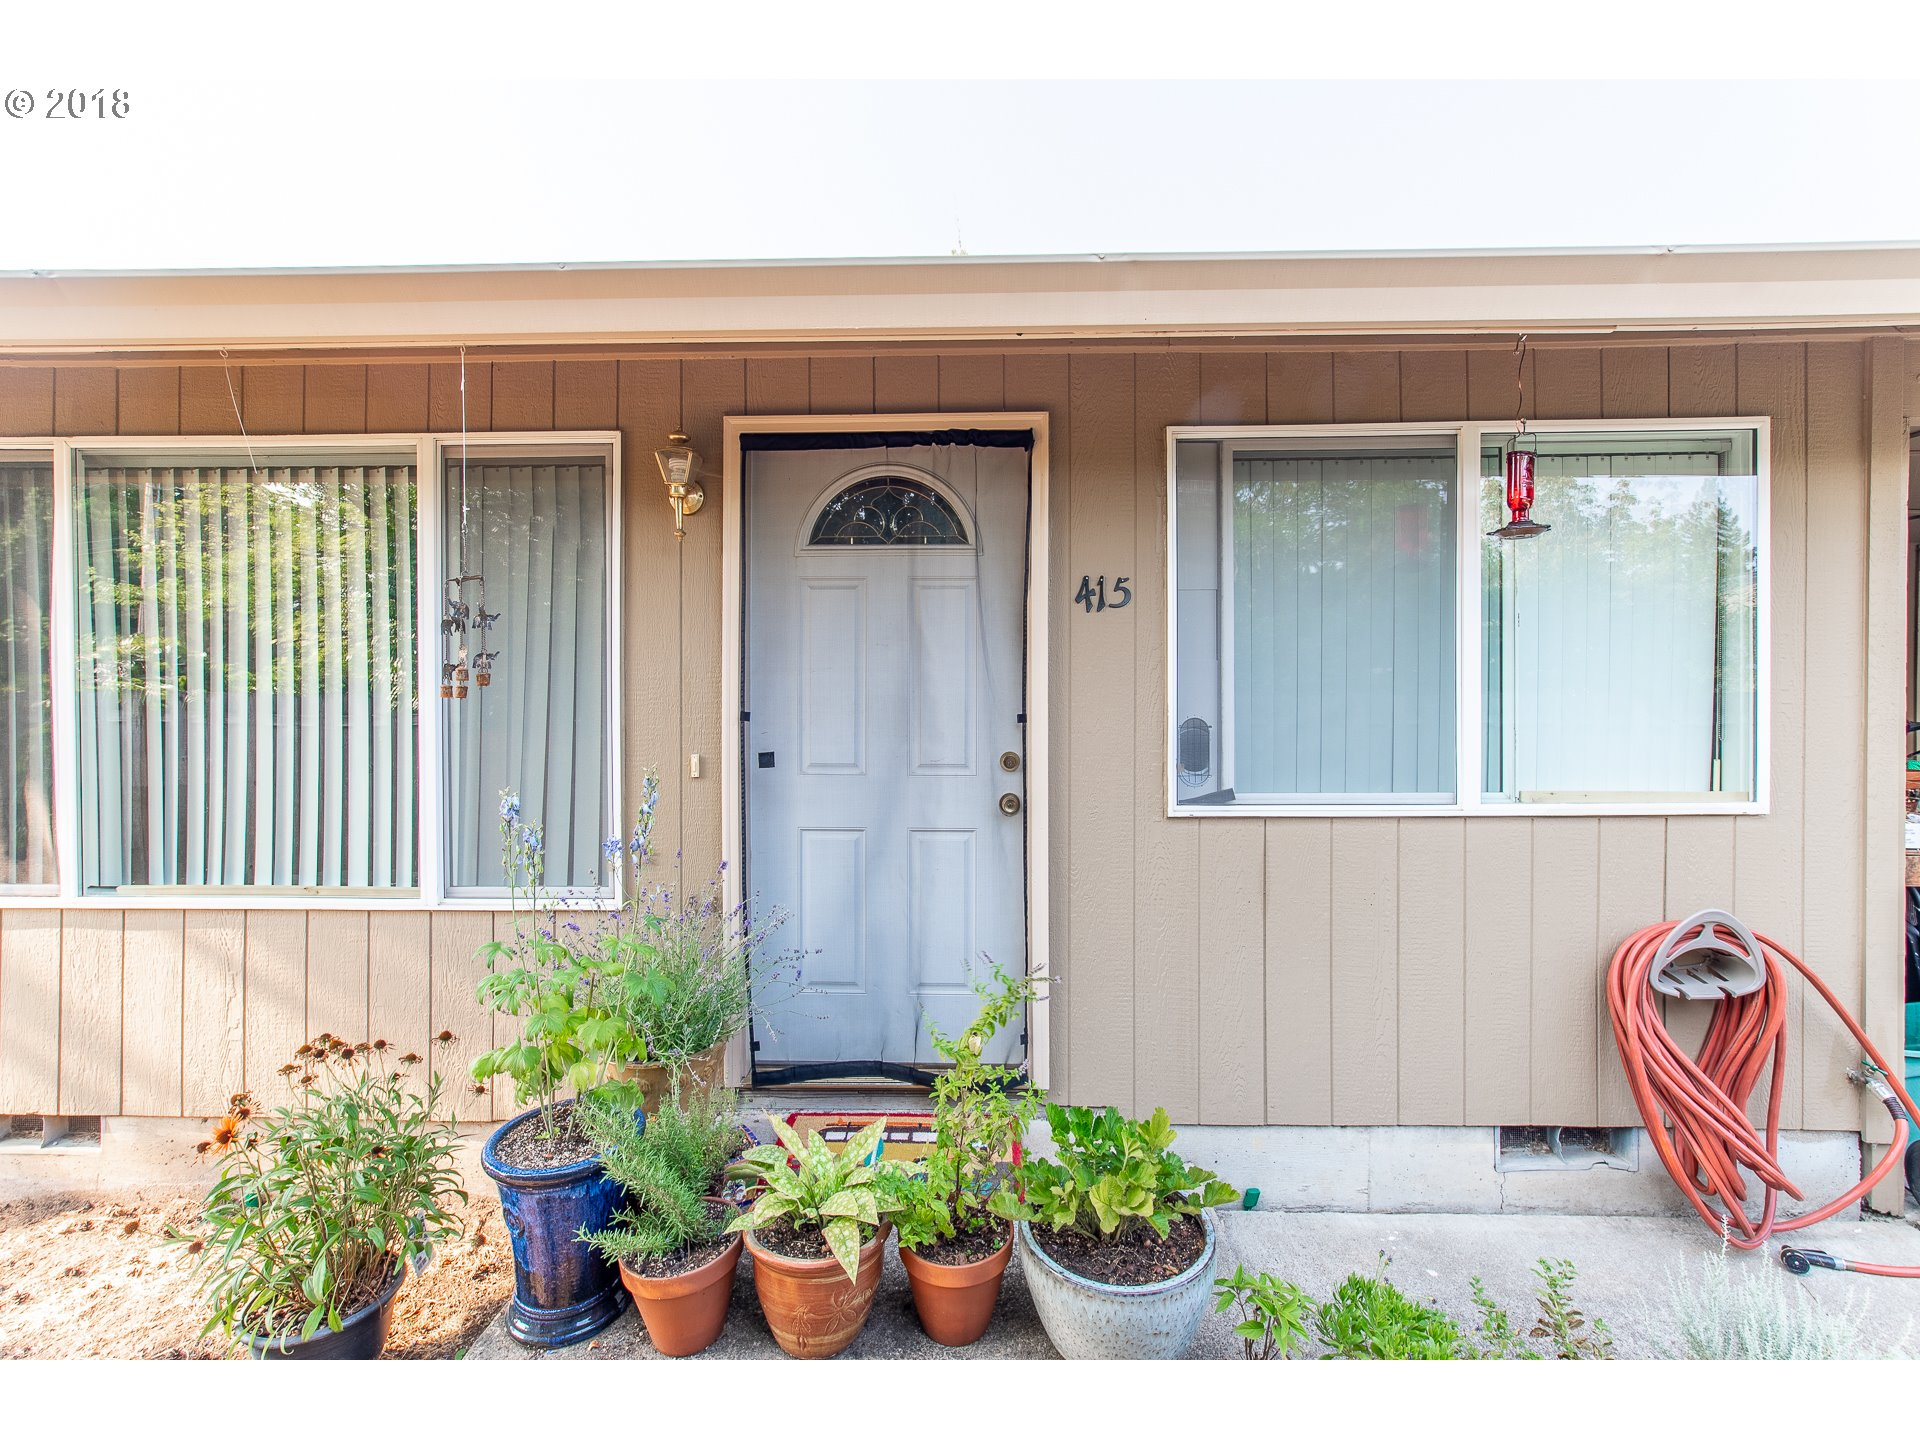 413 S HARRISON ST Newberg, OR 97132 - MLS #: 18698570